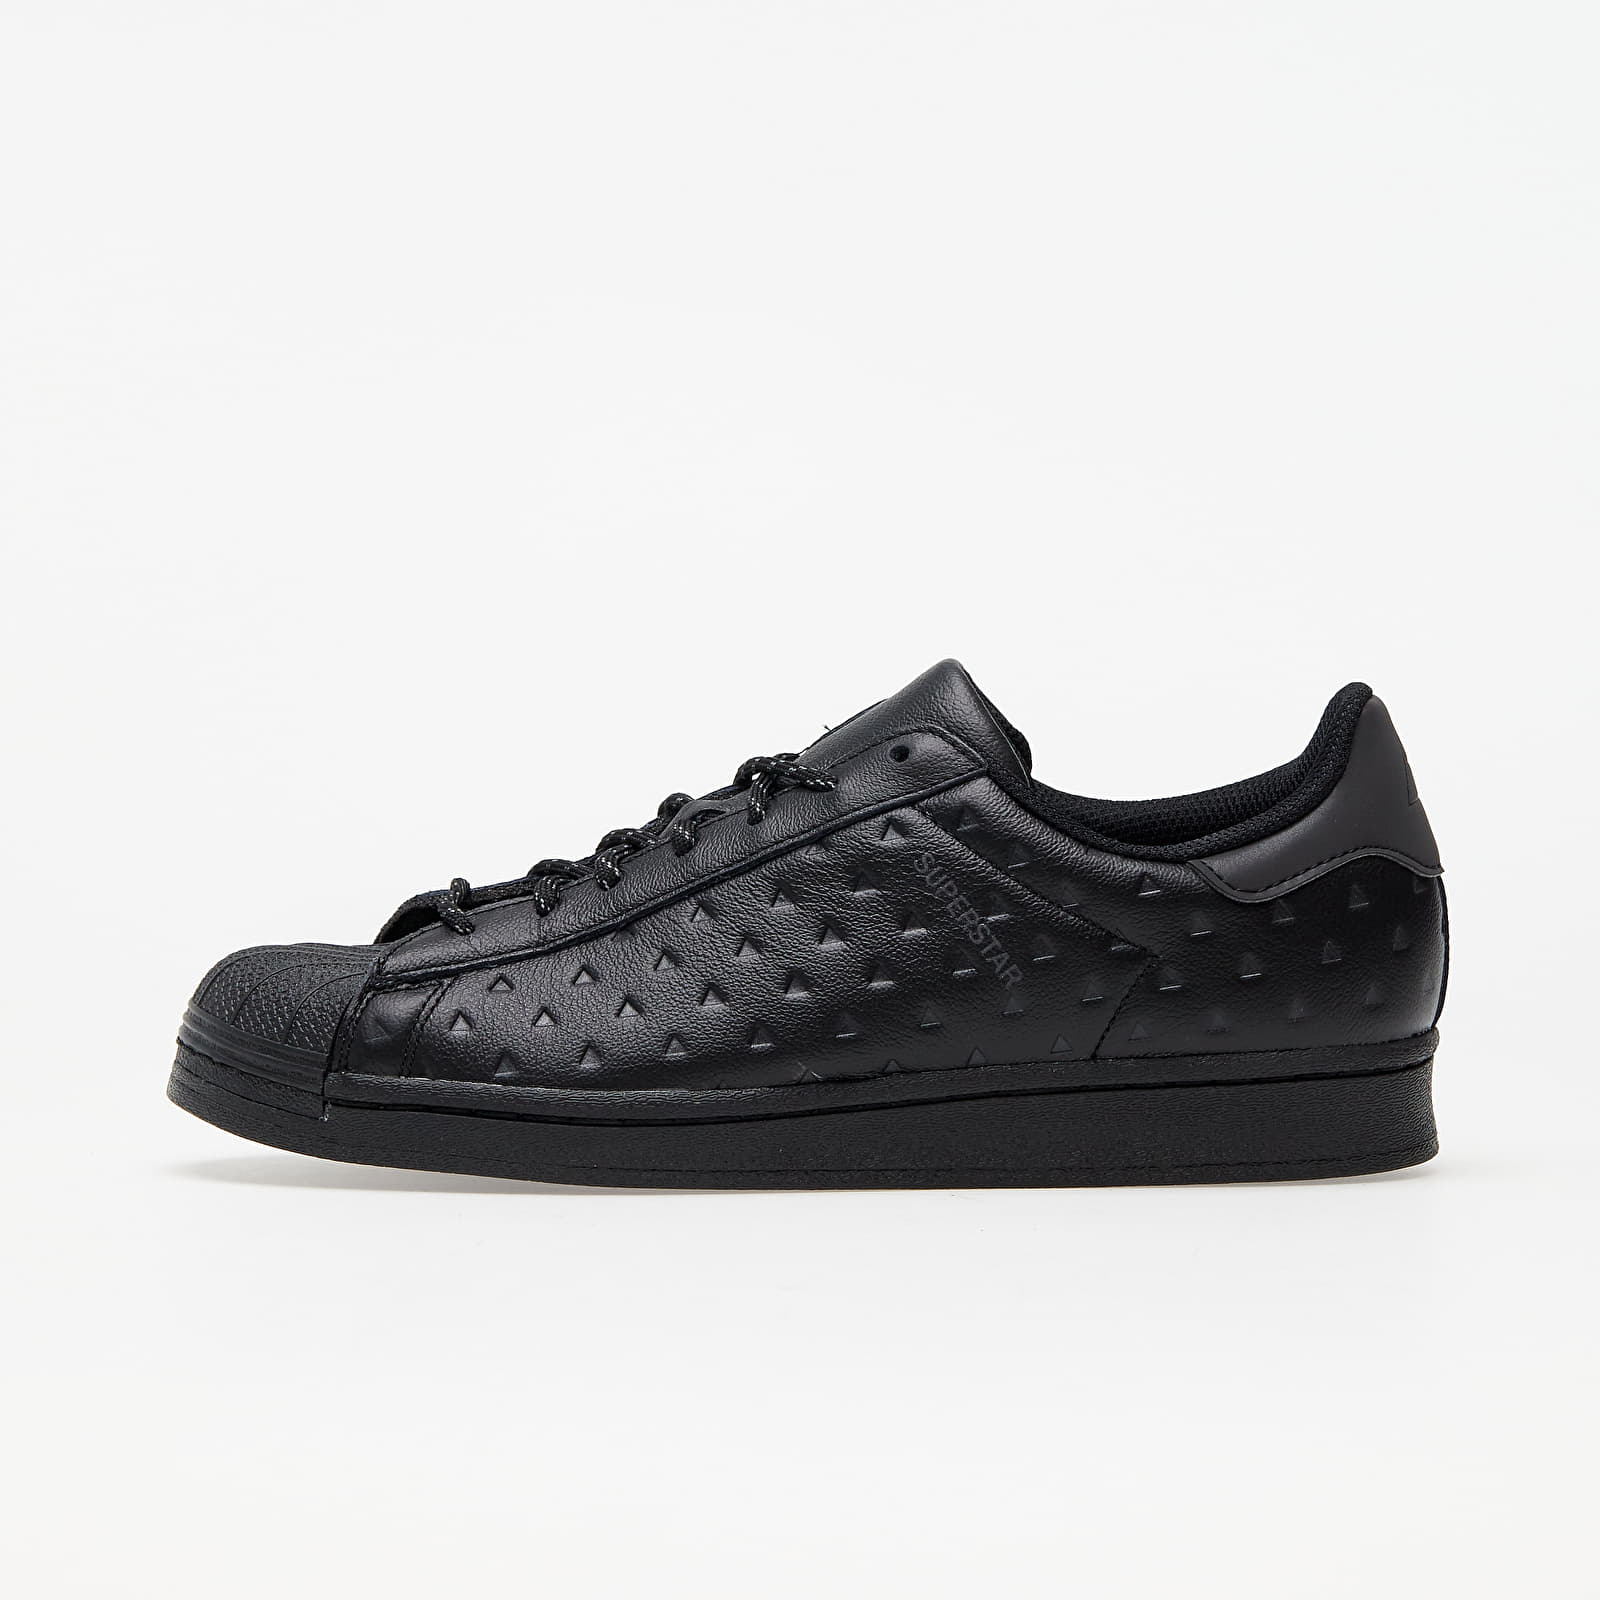 adidas x Pharrell Williams Superstar Core Black/ Core Black/ Core Black EUR 43 1/3